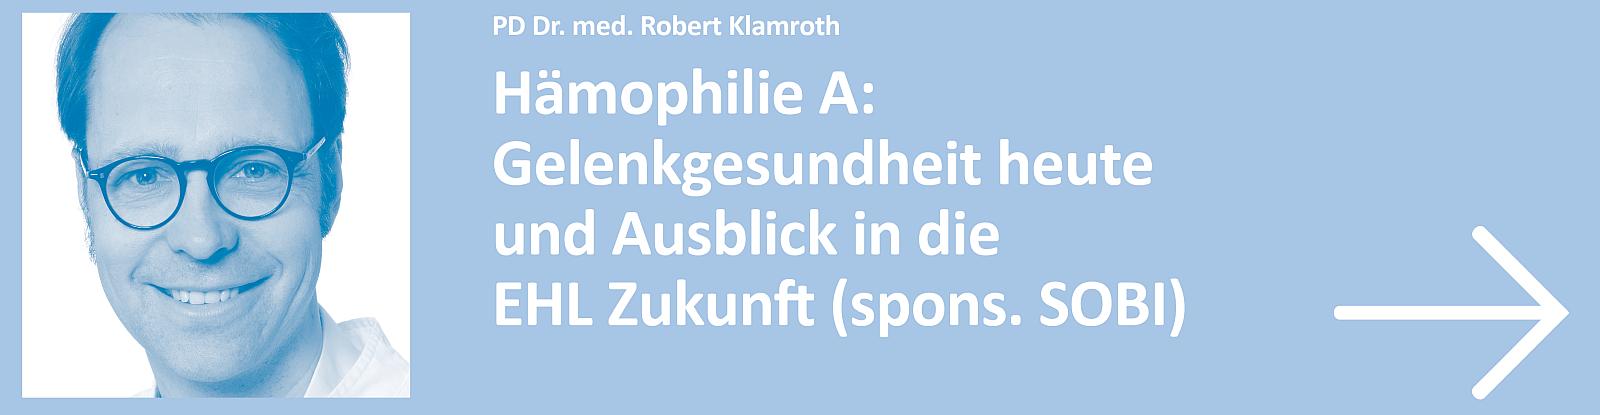 Beitrag R Klamroth_1600x410